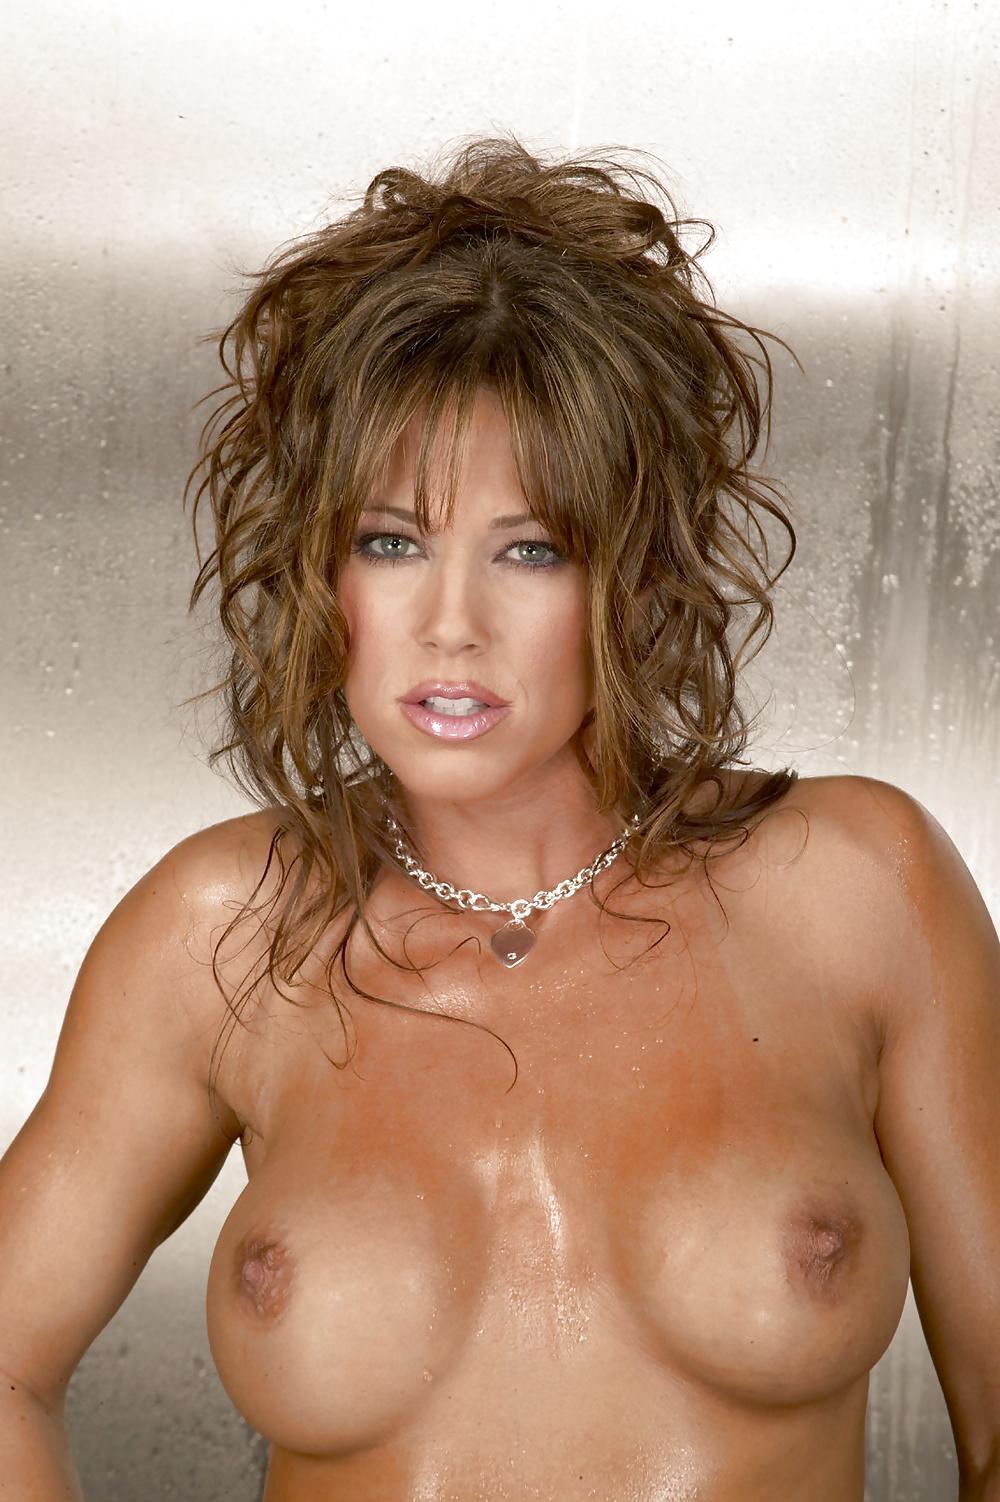 Full leah remini naked tits massage providence naked